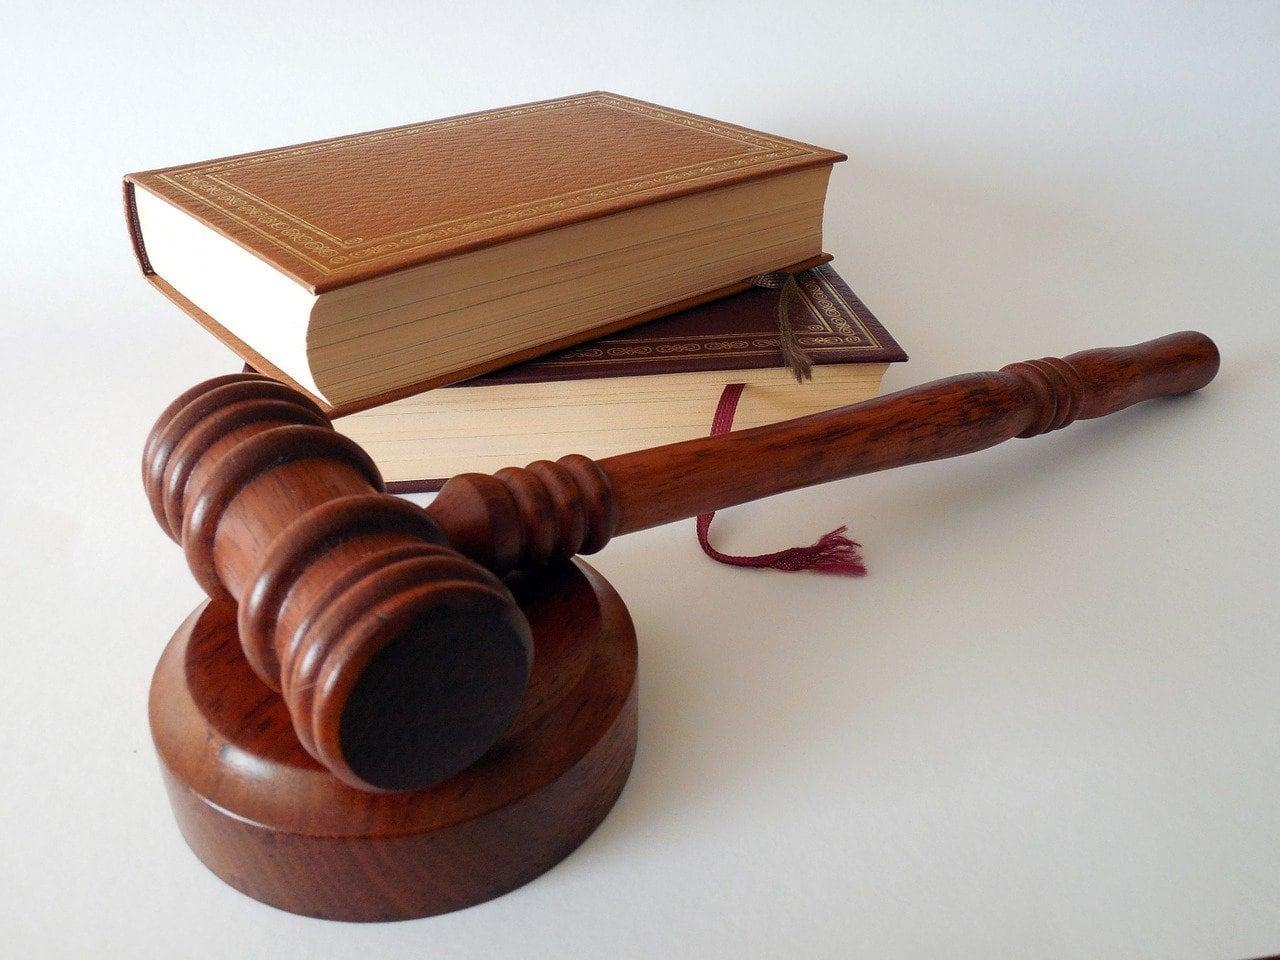 Ilmu Hukum - Jurusan Favorit di UNNES dan Paling Banyak Peminat Universitas Negeri Semarang